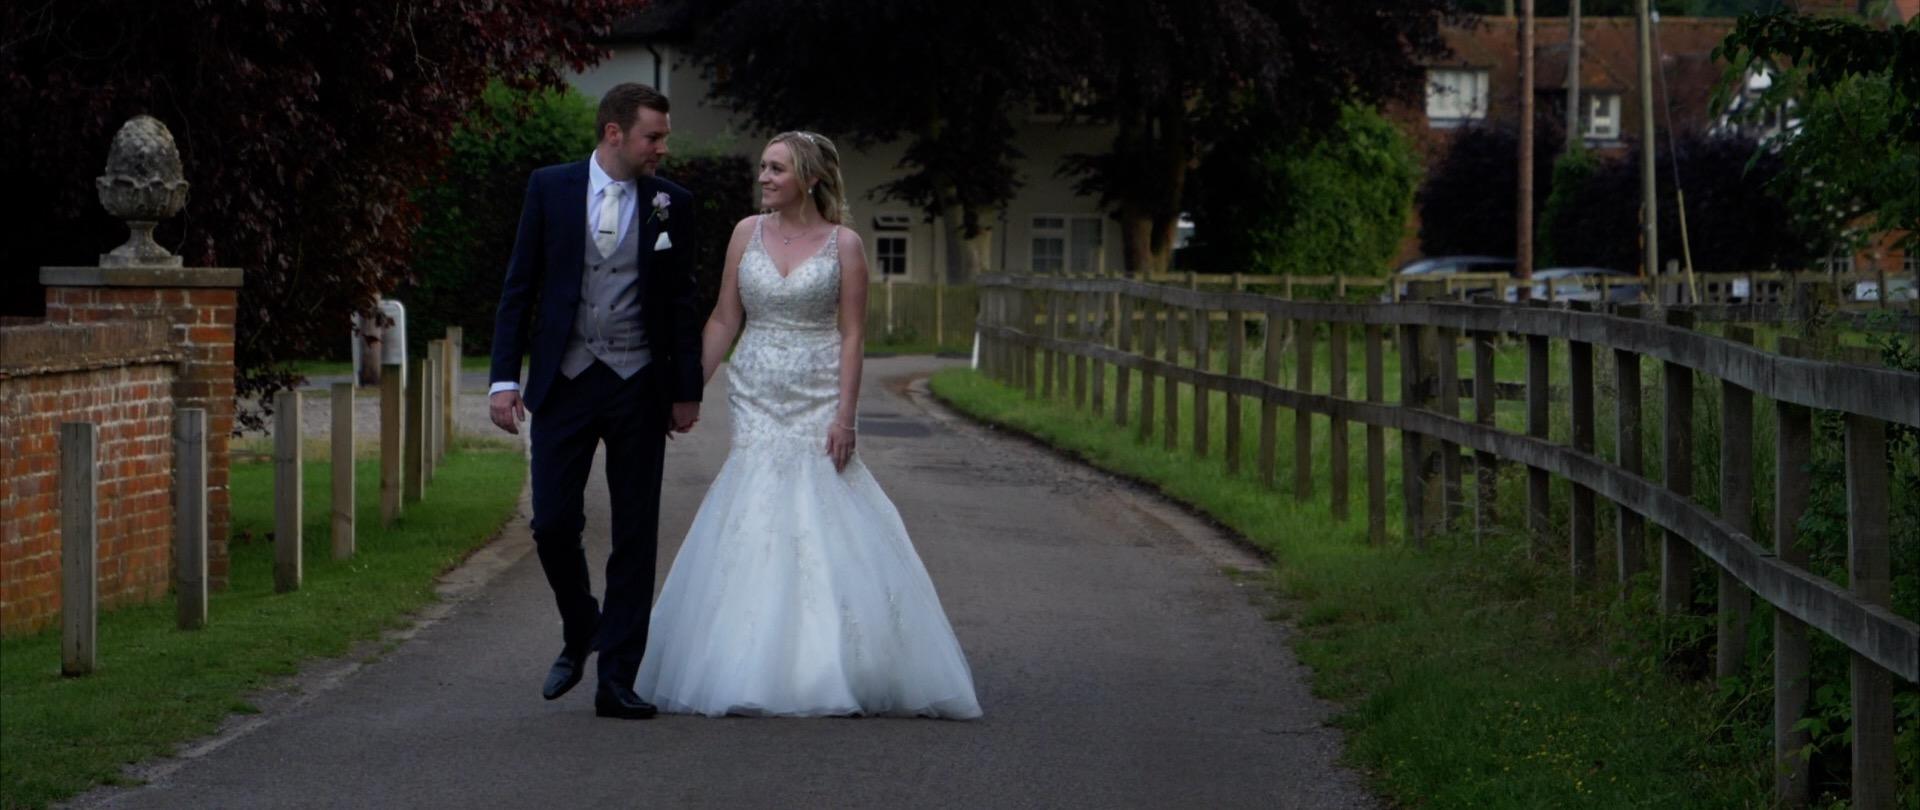 Wedding couple videography Essex.jpg